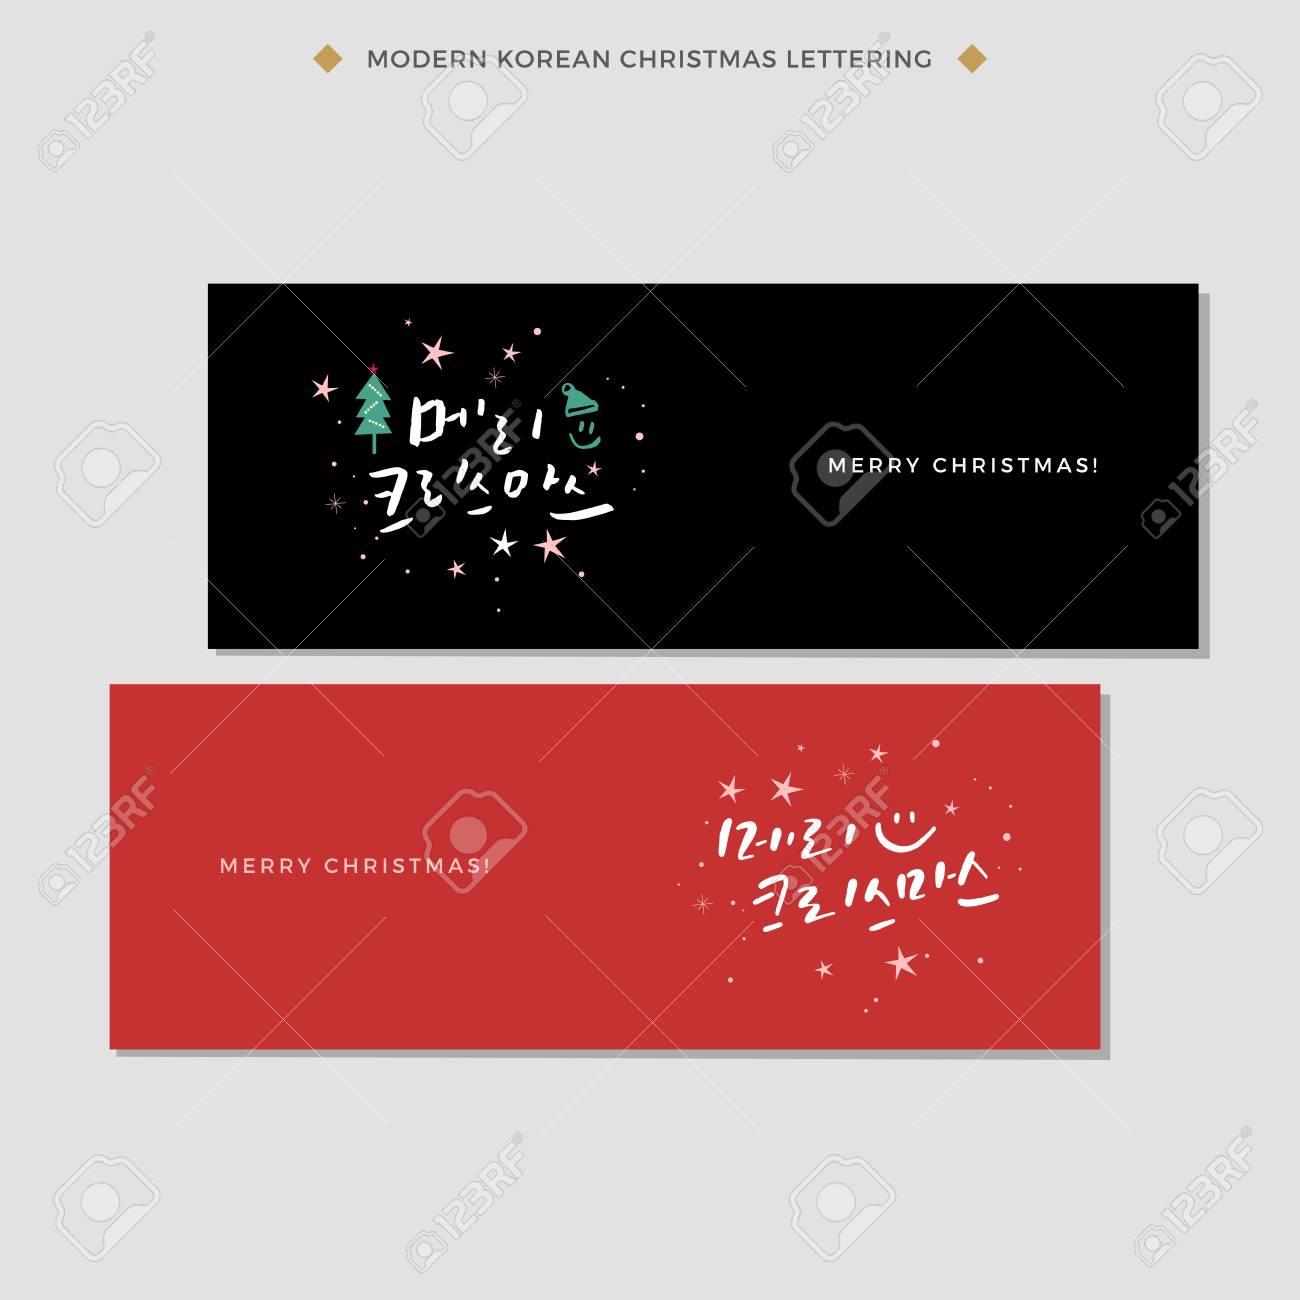 Koreanisch Frohe Weihnachten.Hand Lettered Merry Christmas Modern Korean Hand Lettering Collection